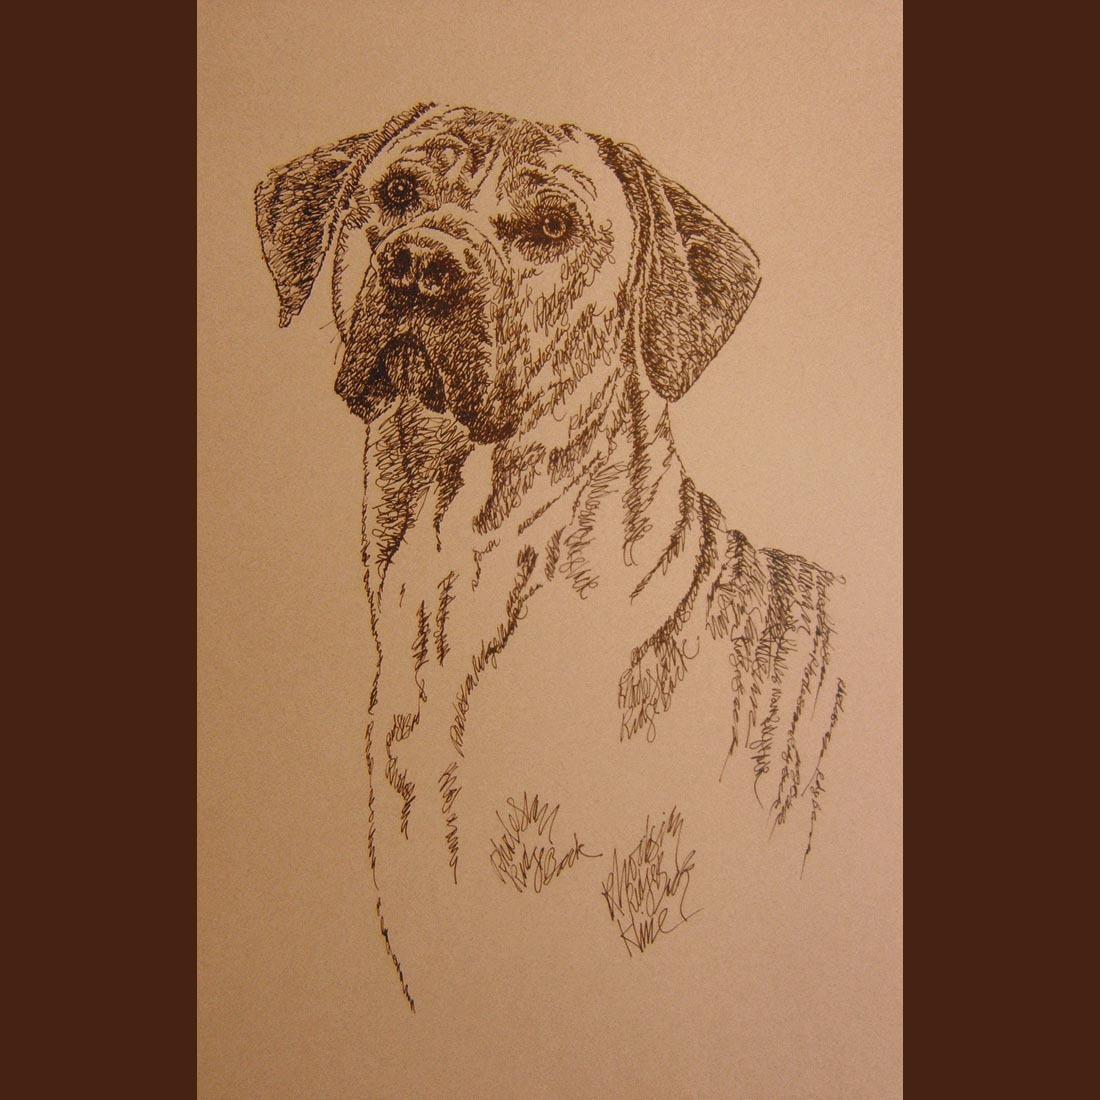 Rhodesian Ridgeback DOG ART Kline Signed Print - Your dogs name added free. GIFT Bonanza